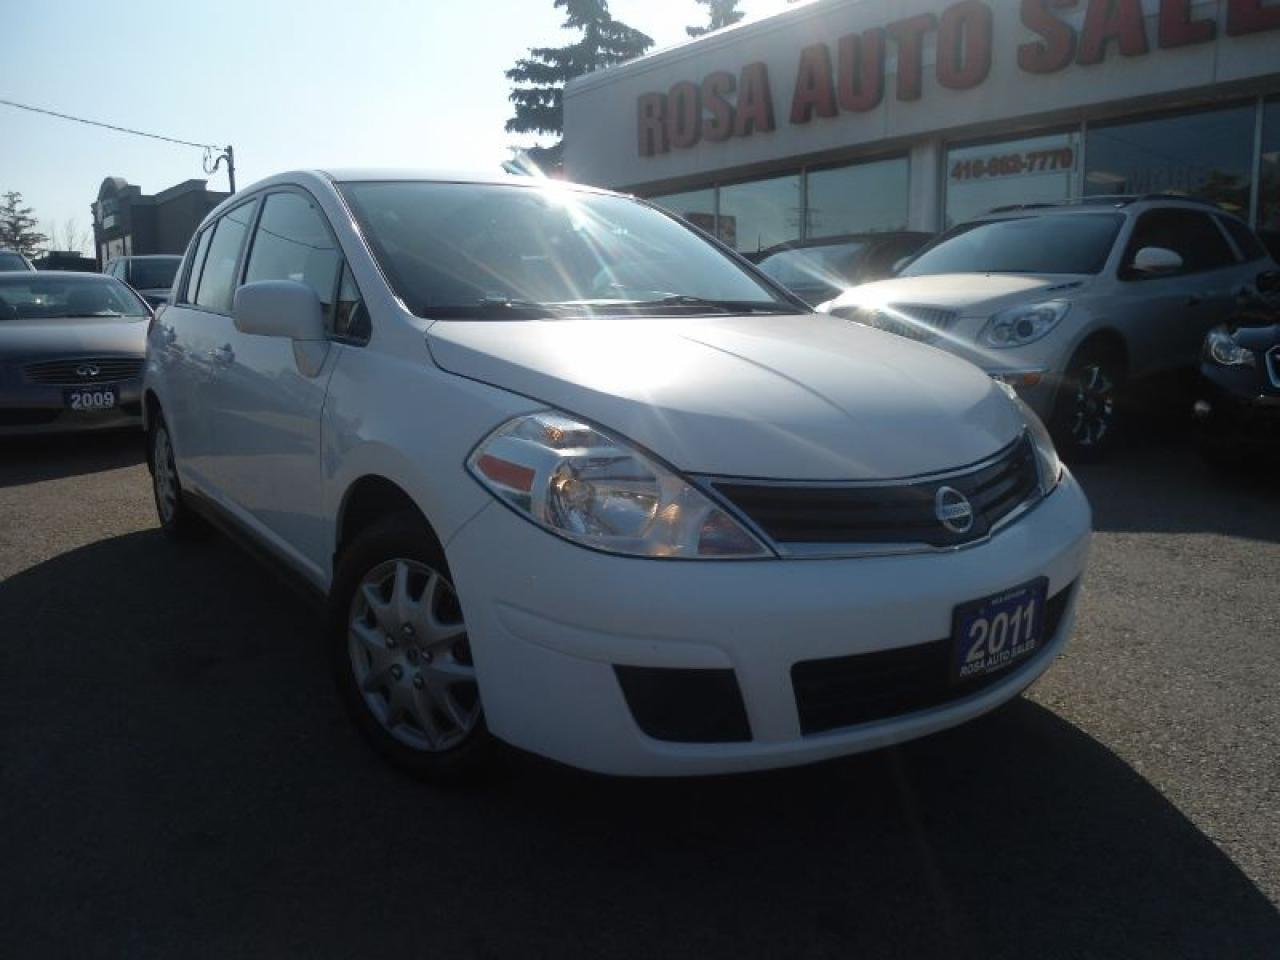 2011 Nissan Versa 5dr HB GAS SAVER 1.8 SL I POD CONNECTION 4 NEW TIR